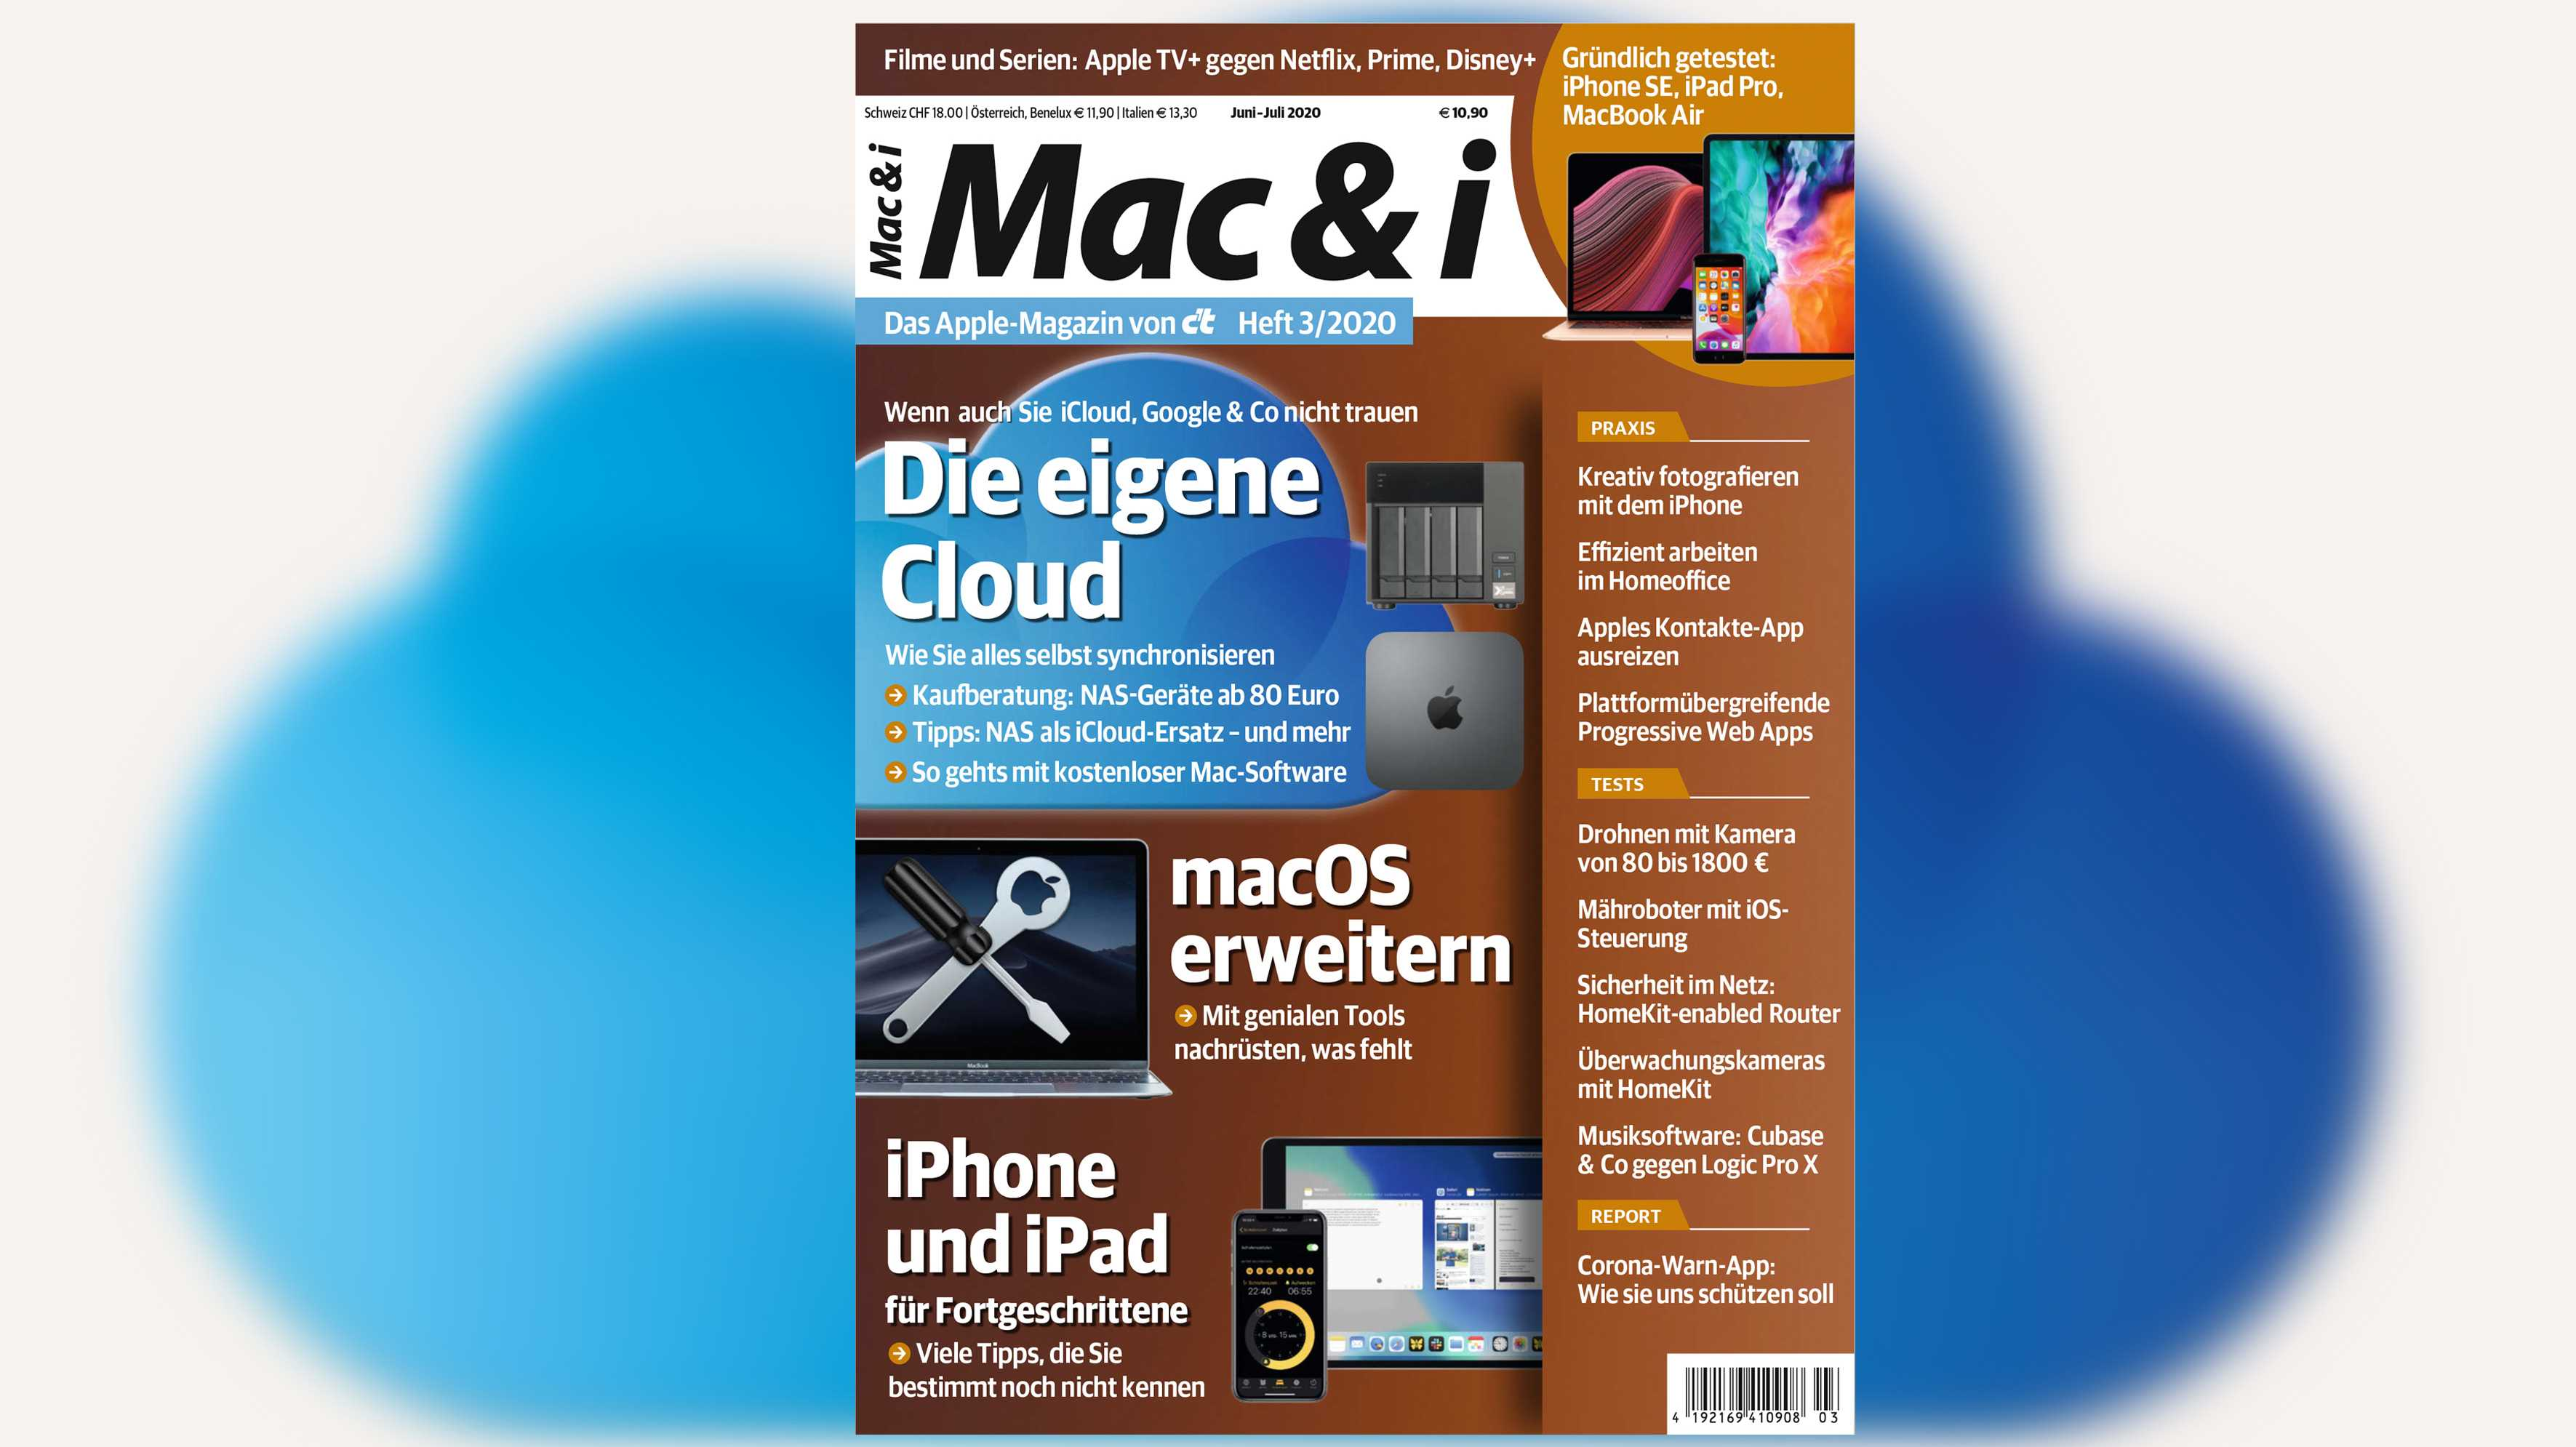 Mac & i Heft 3/2020 jetzt vorab im heise-Kiosk